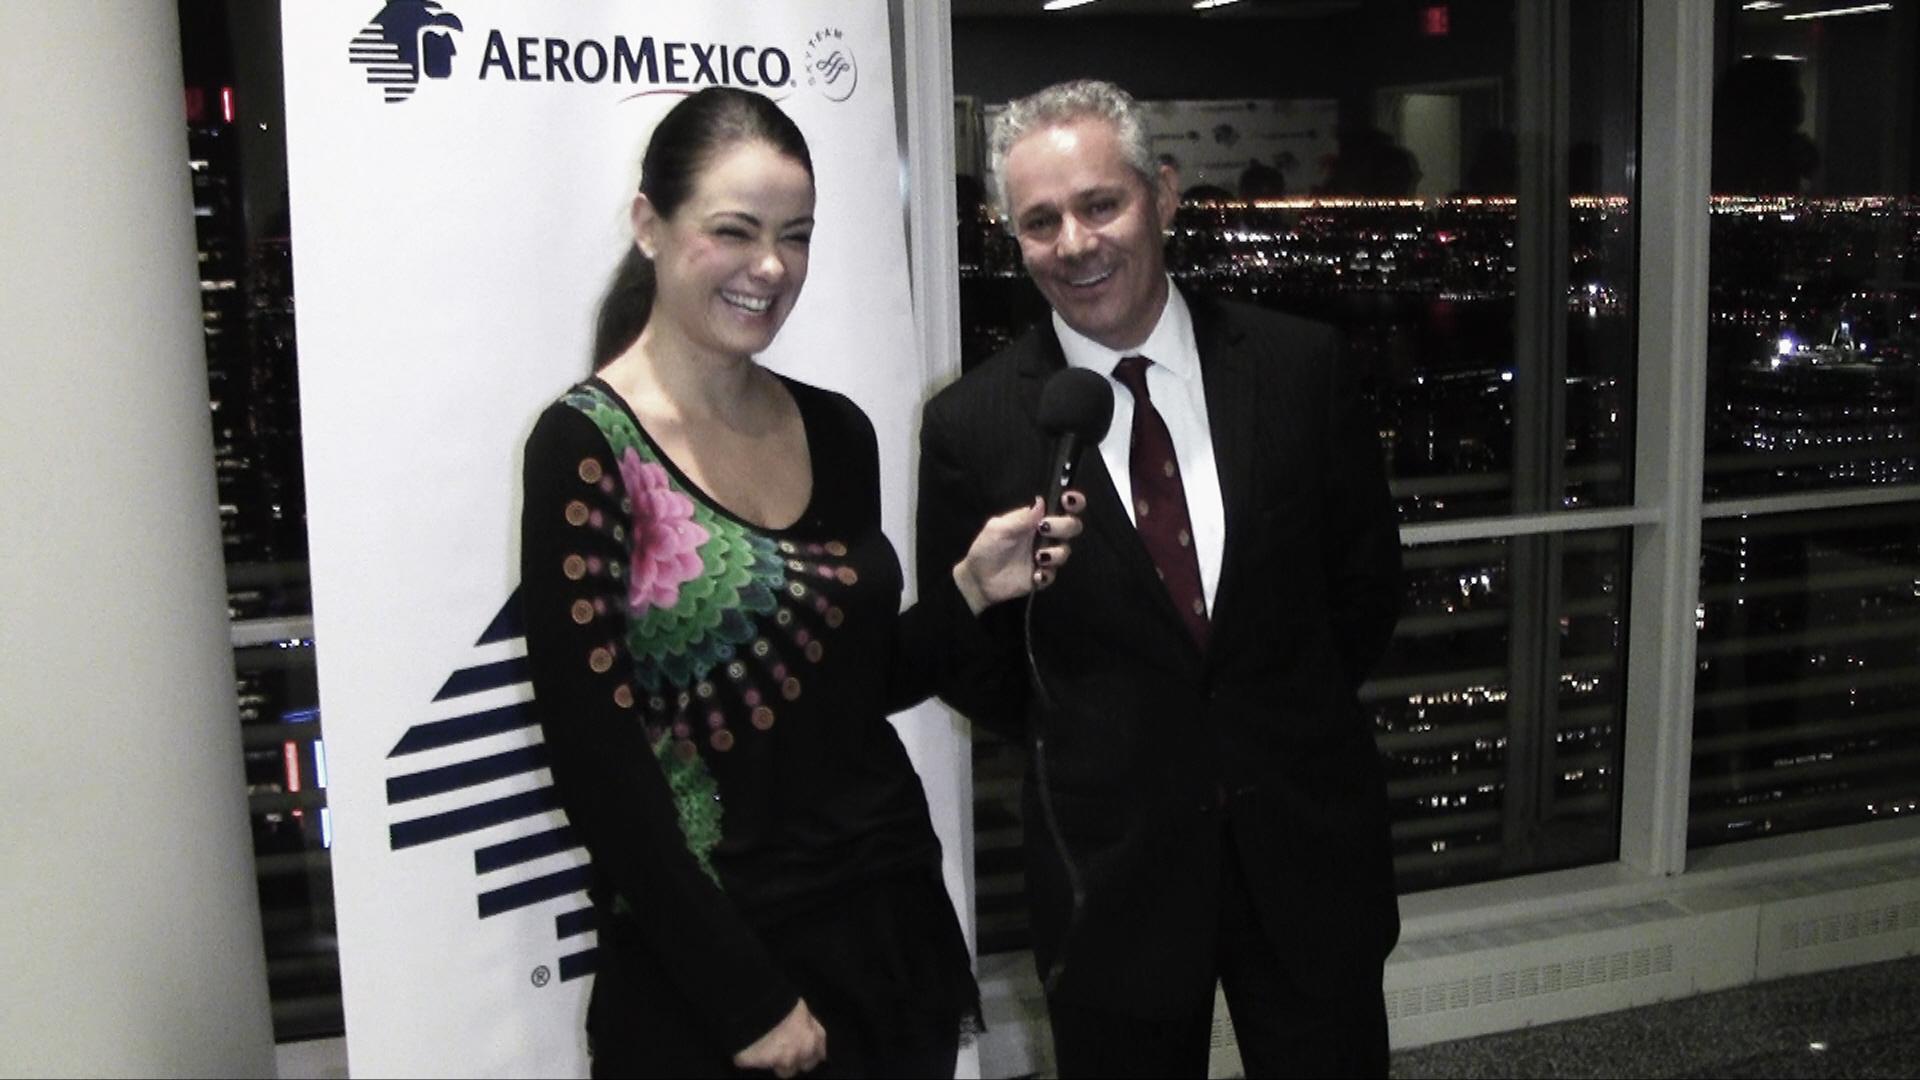 New Service 2014 - AeroMexico